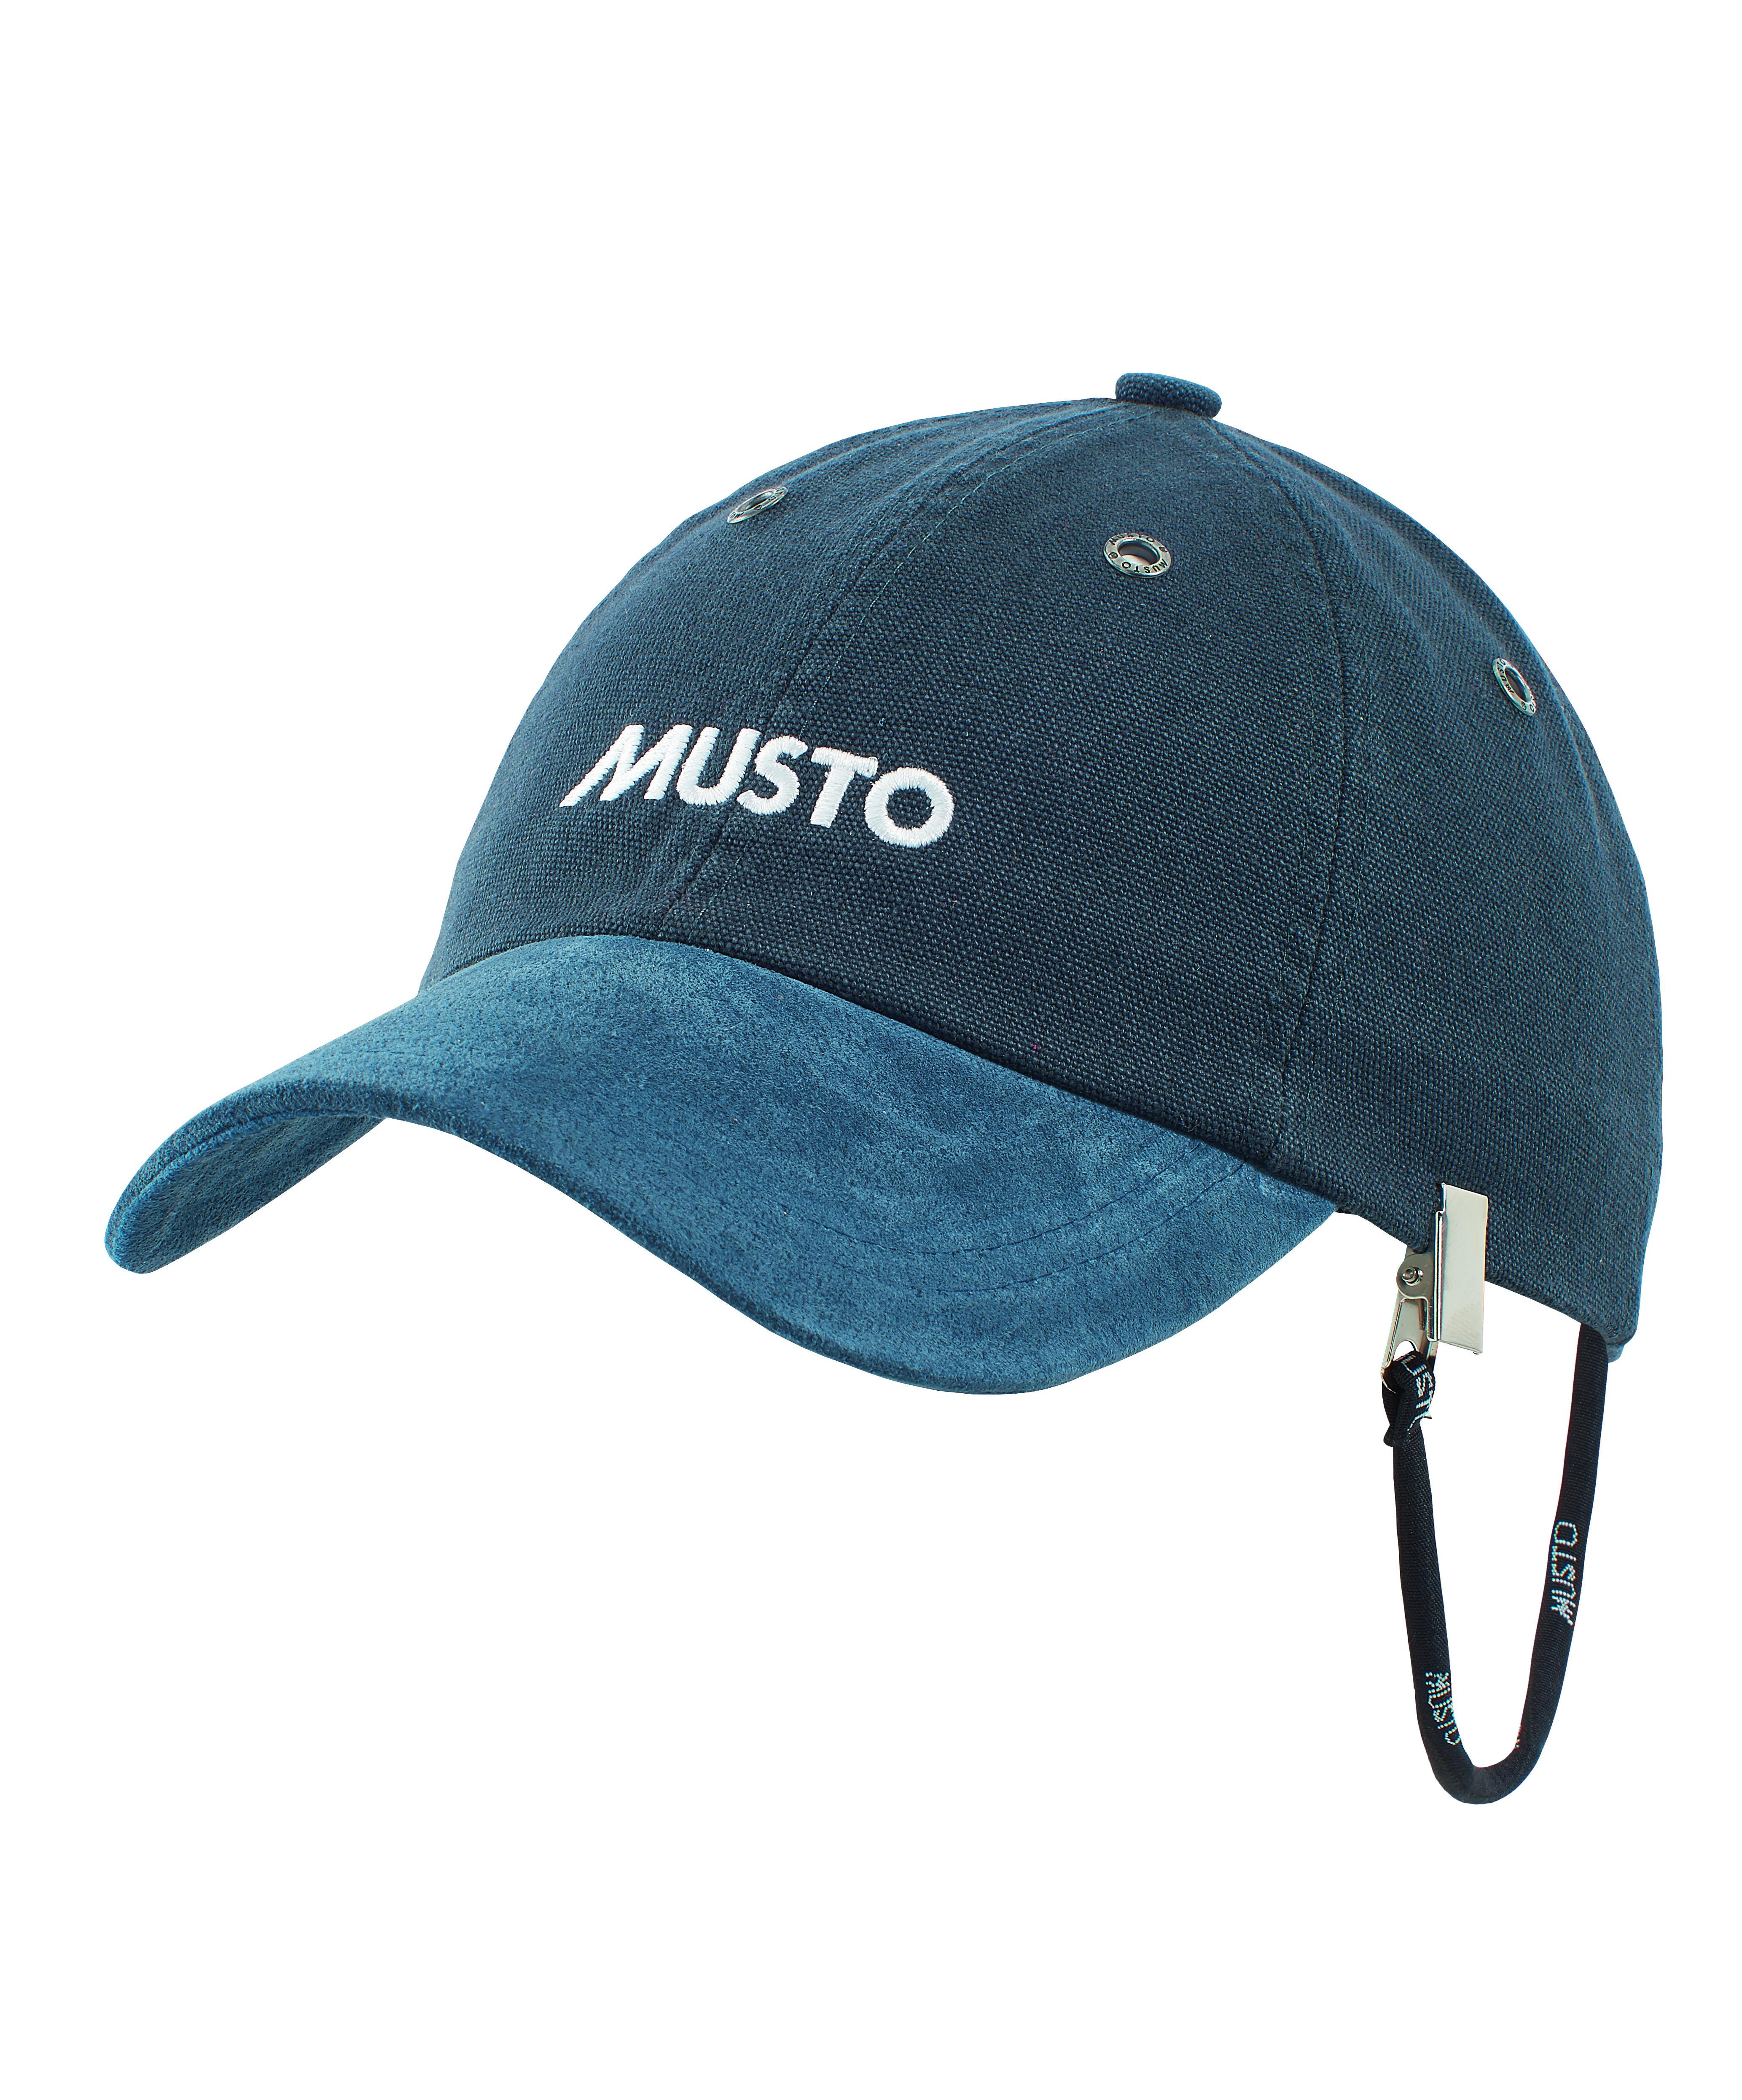 Musto evo orginal crew keps navy